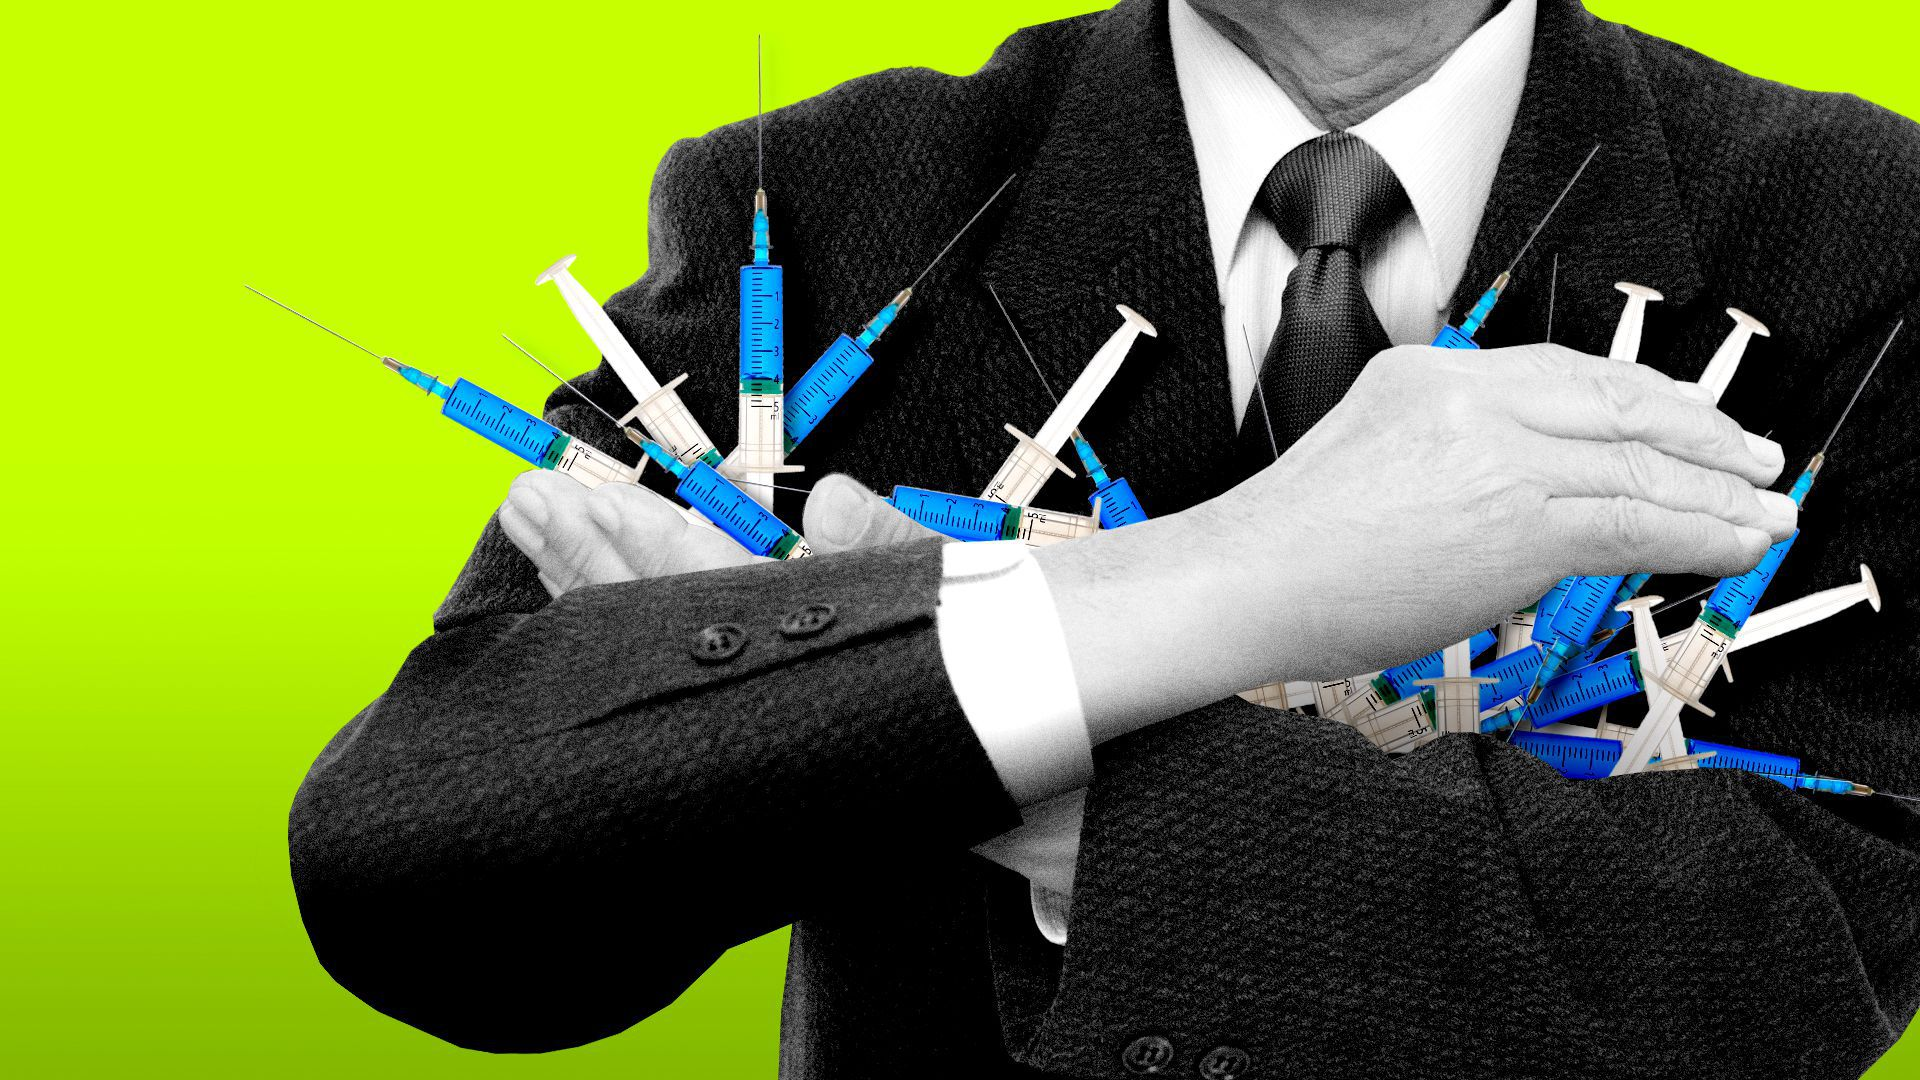 Vaccine disparity is the biggest international failure in decades - Axios